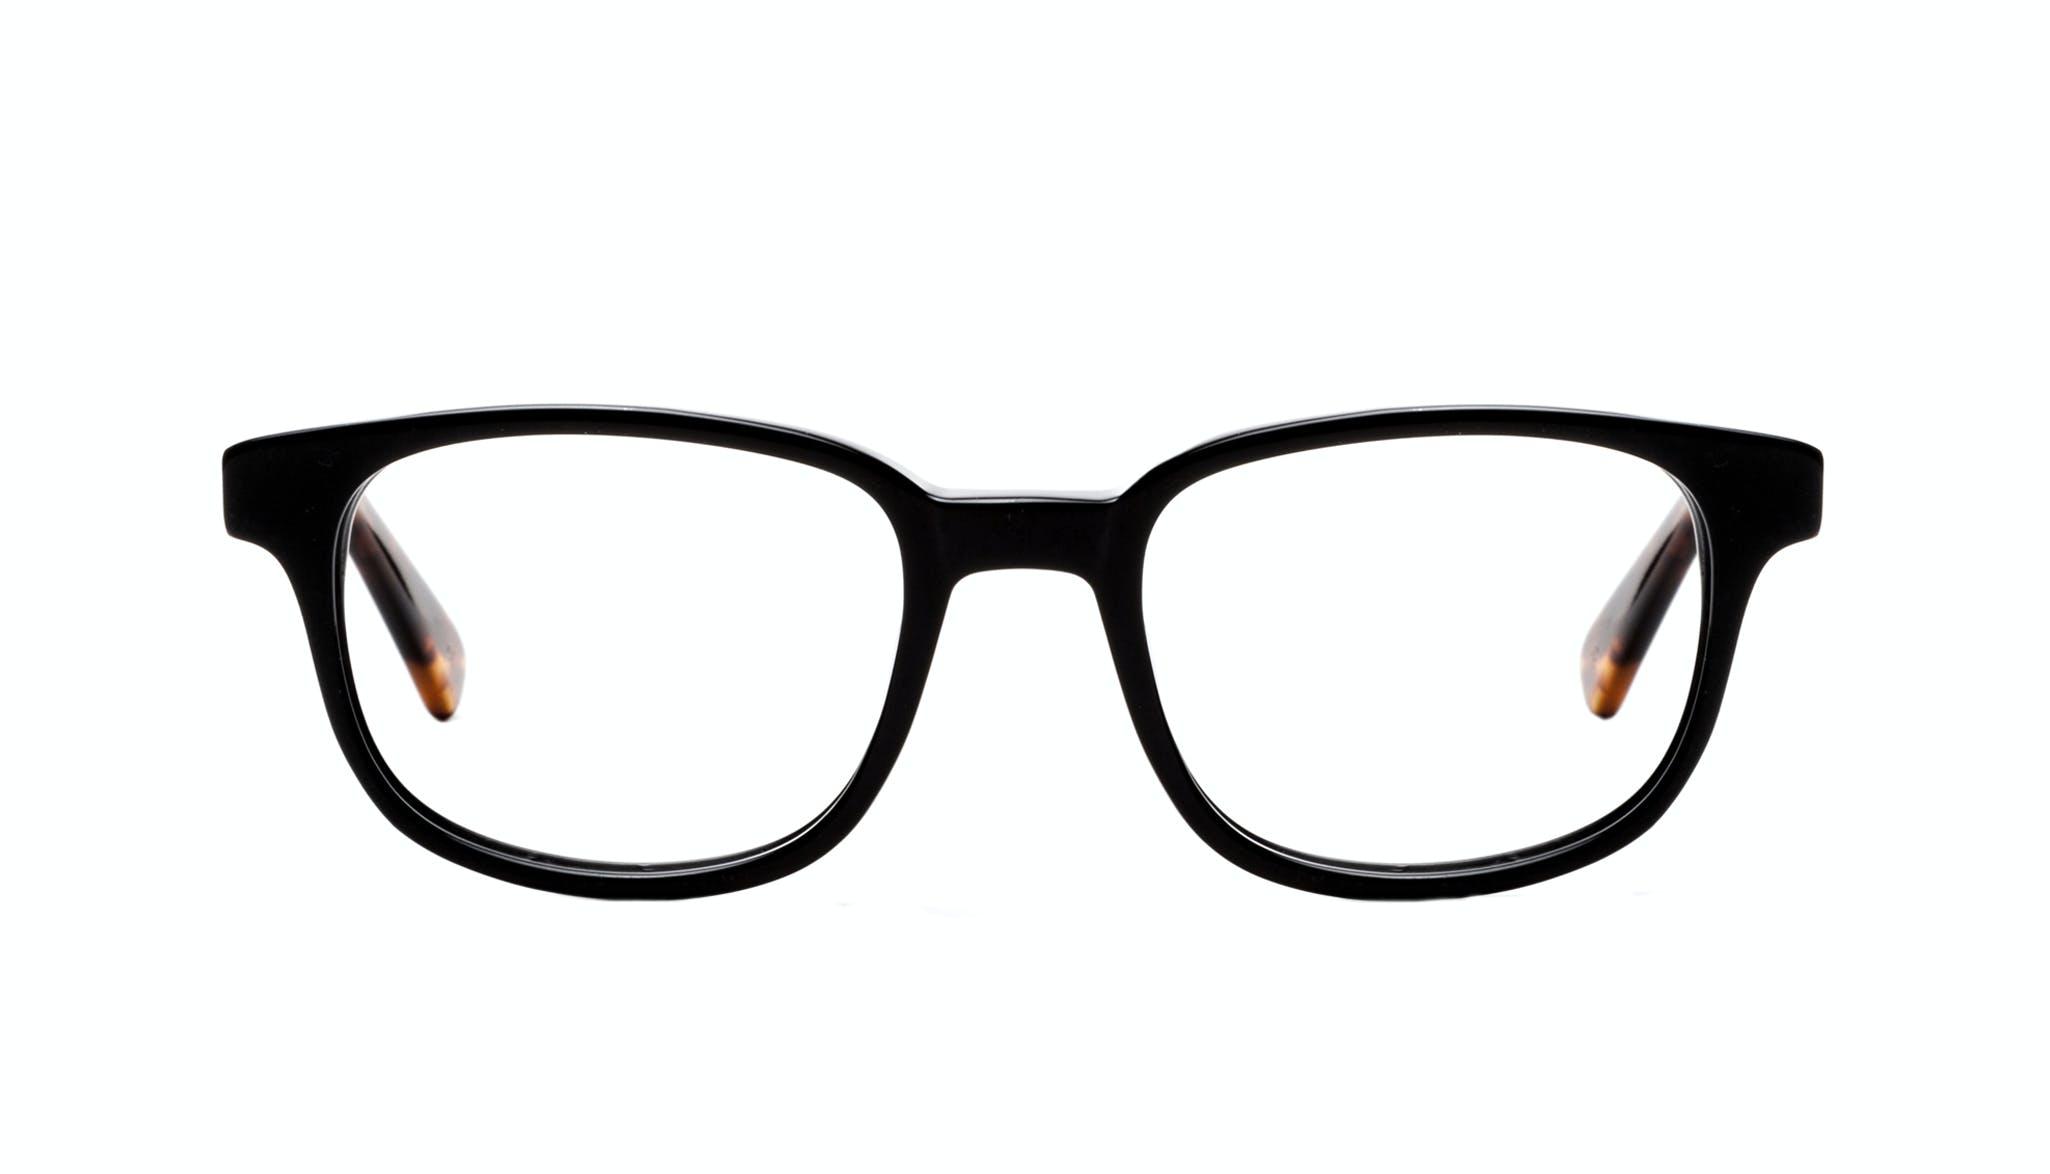 Affordable Fashion Glasses Rectangle Square Eyeglasses Men Magnetic Onyx Sepia Front